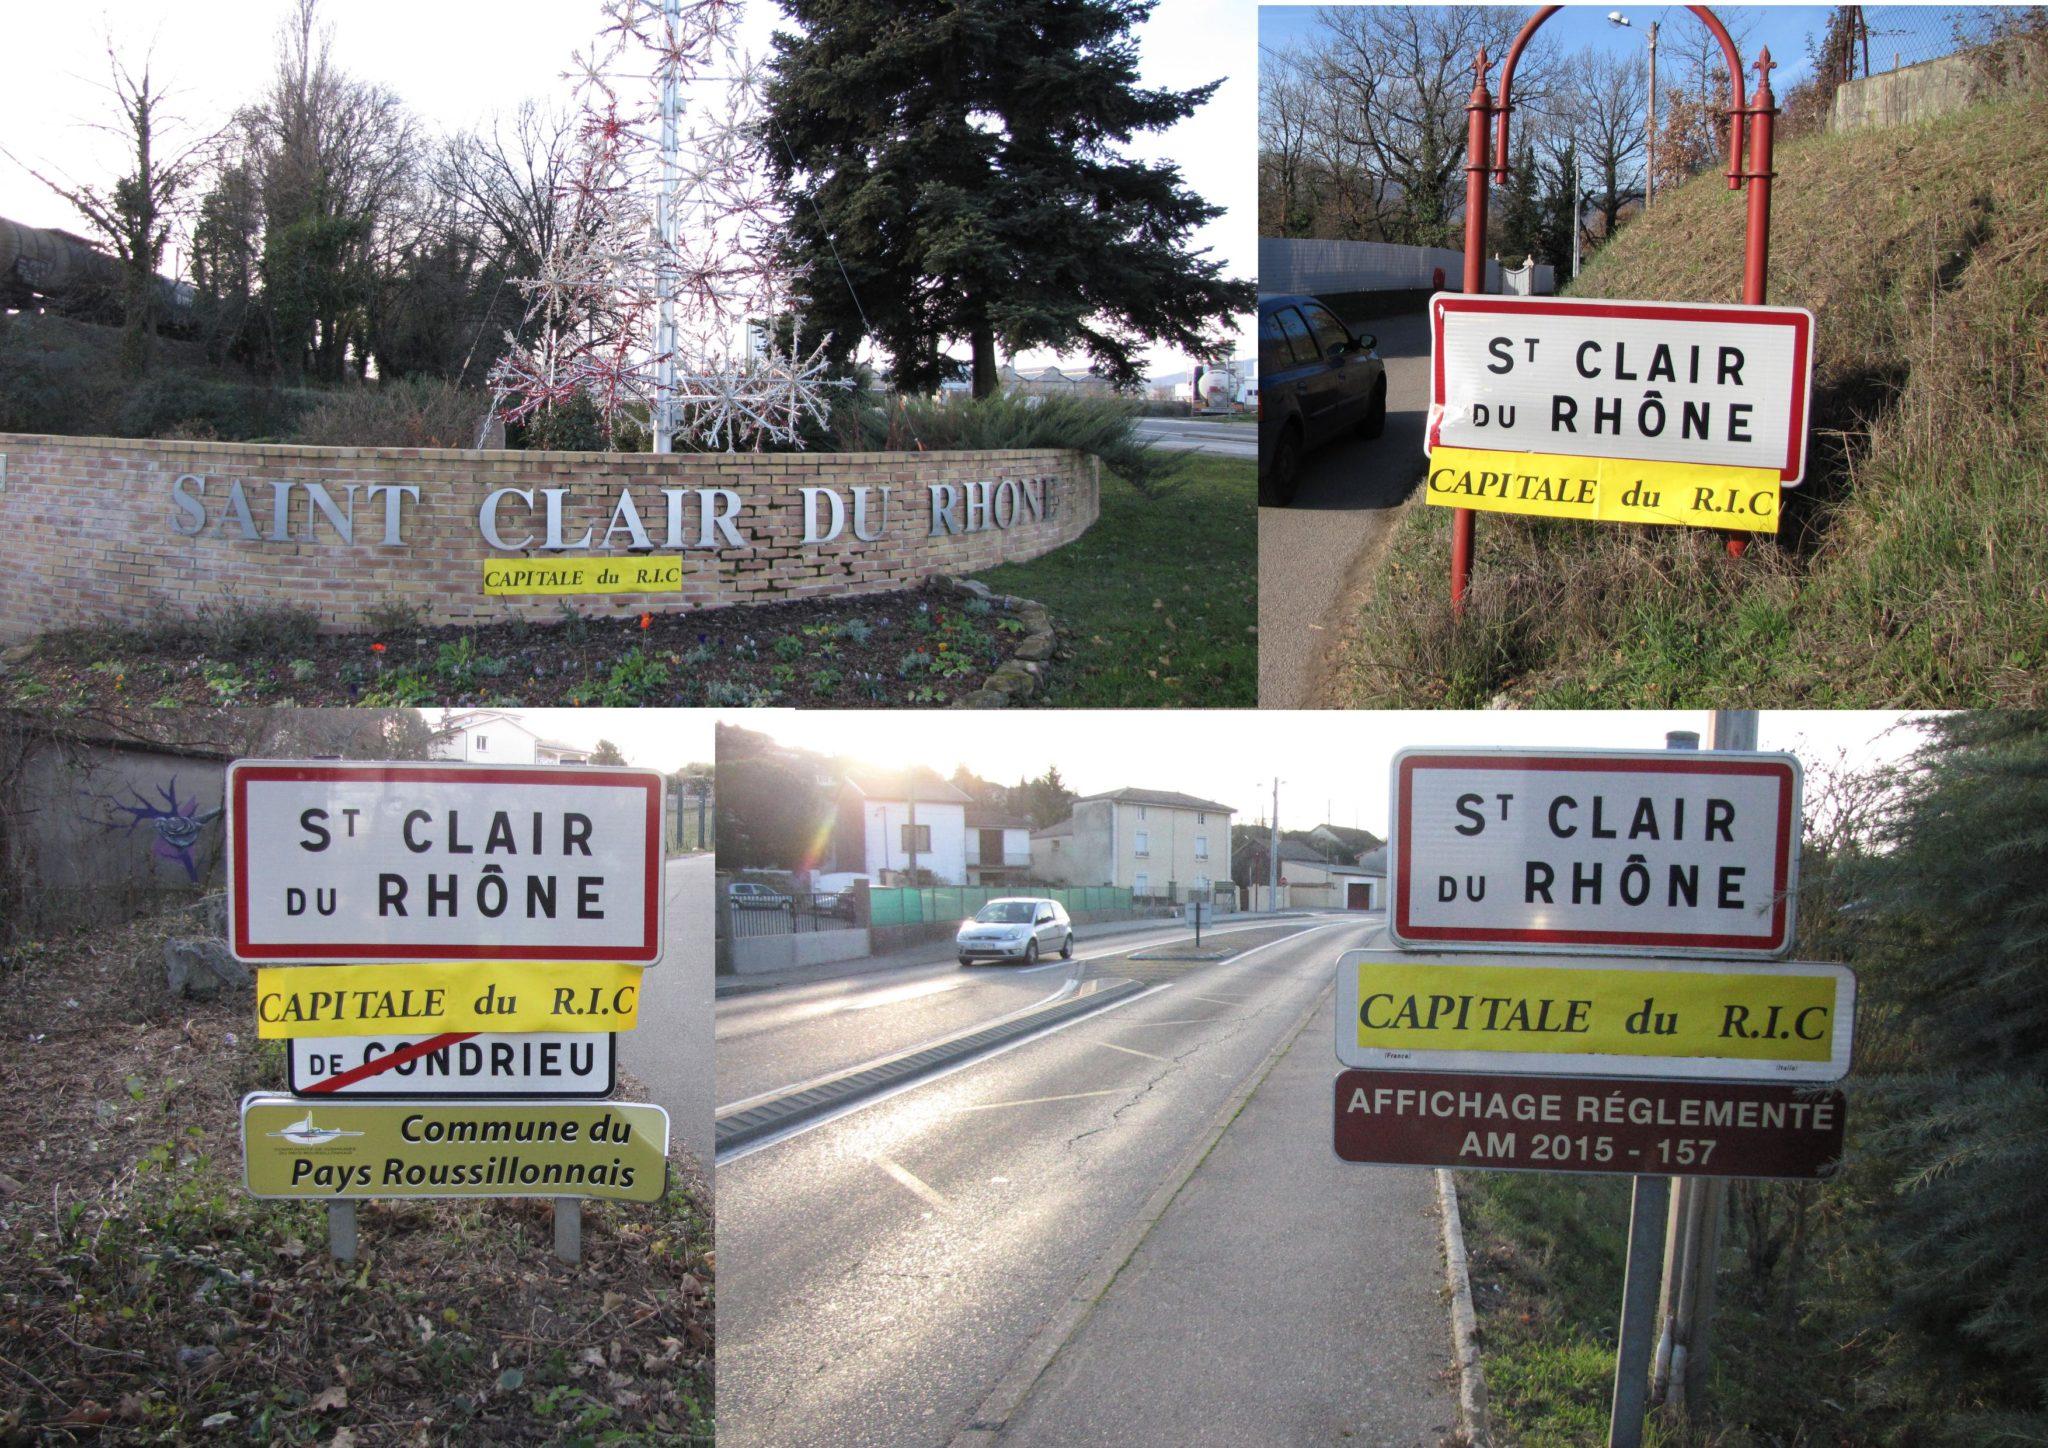 Résultats : St Clair du Rhône = 1  Emmanuel Macron = 0